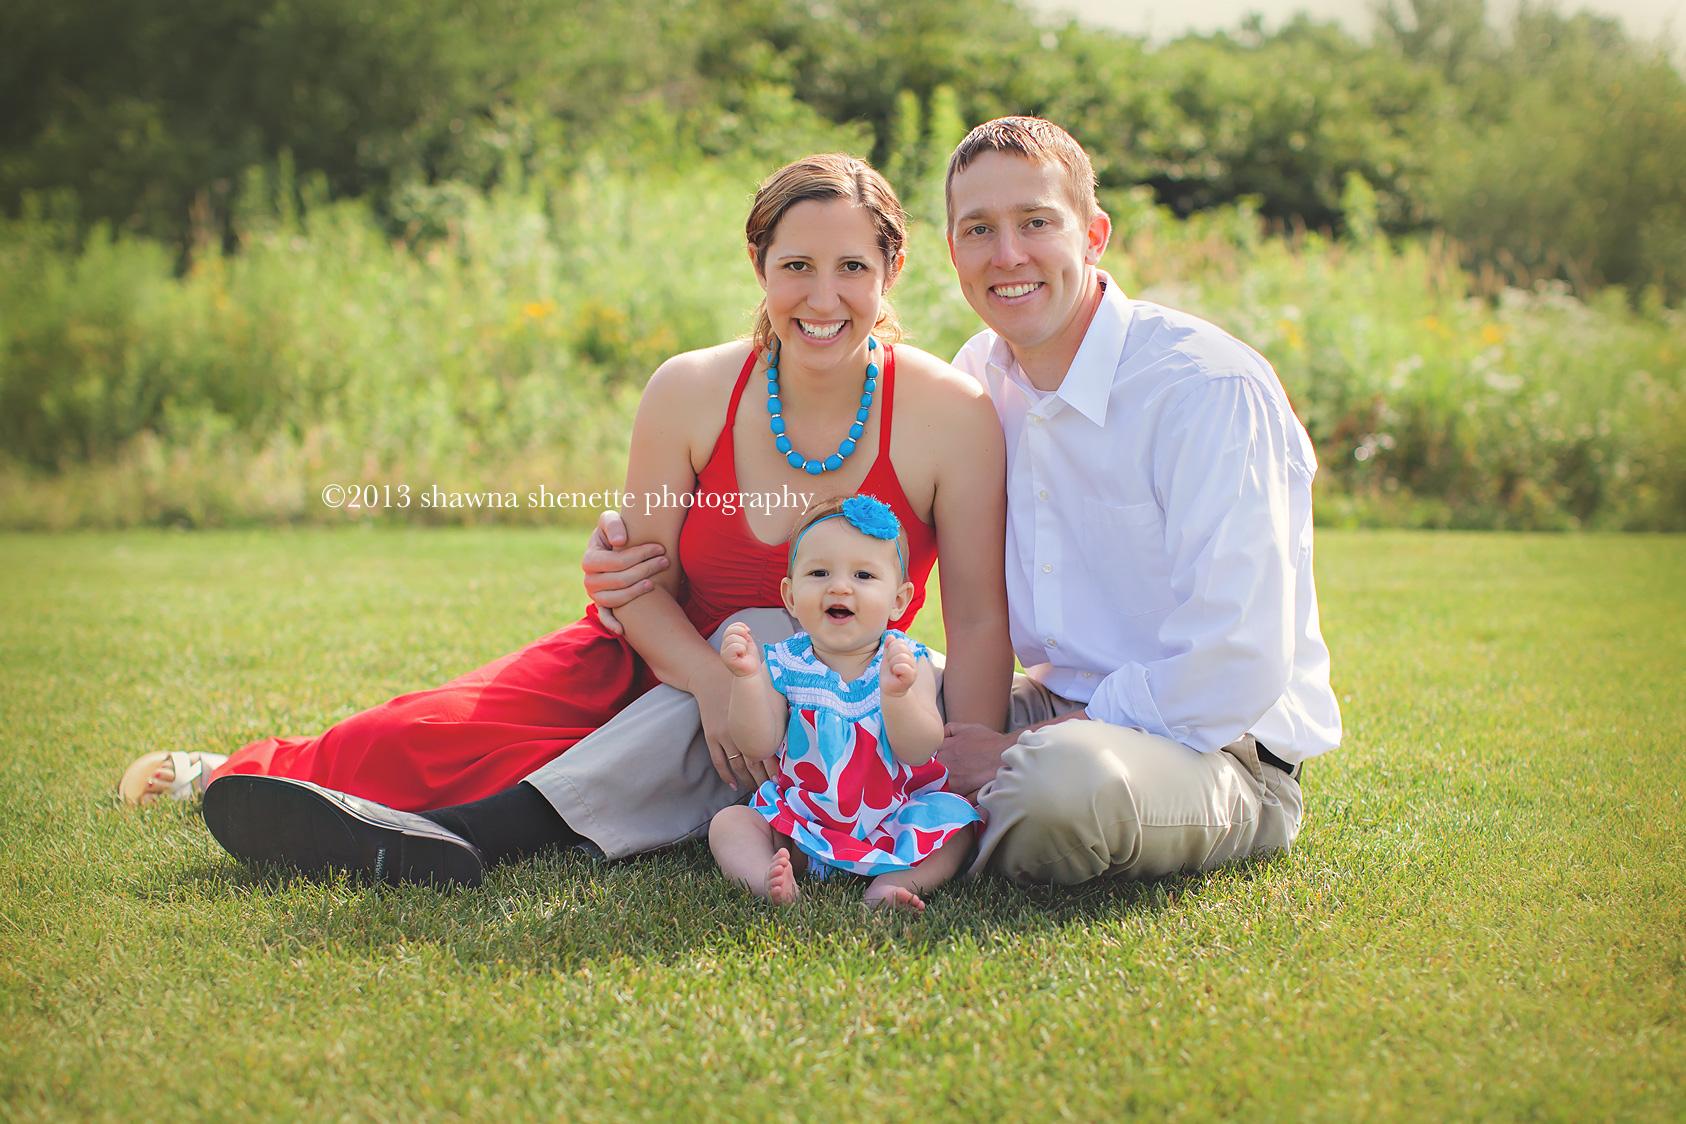 Massachusetts Family Photographer Outdoors Millbury, Ma Family Photography Summer Baby Girl Child Photographer